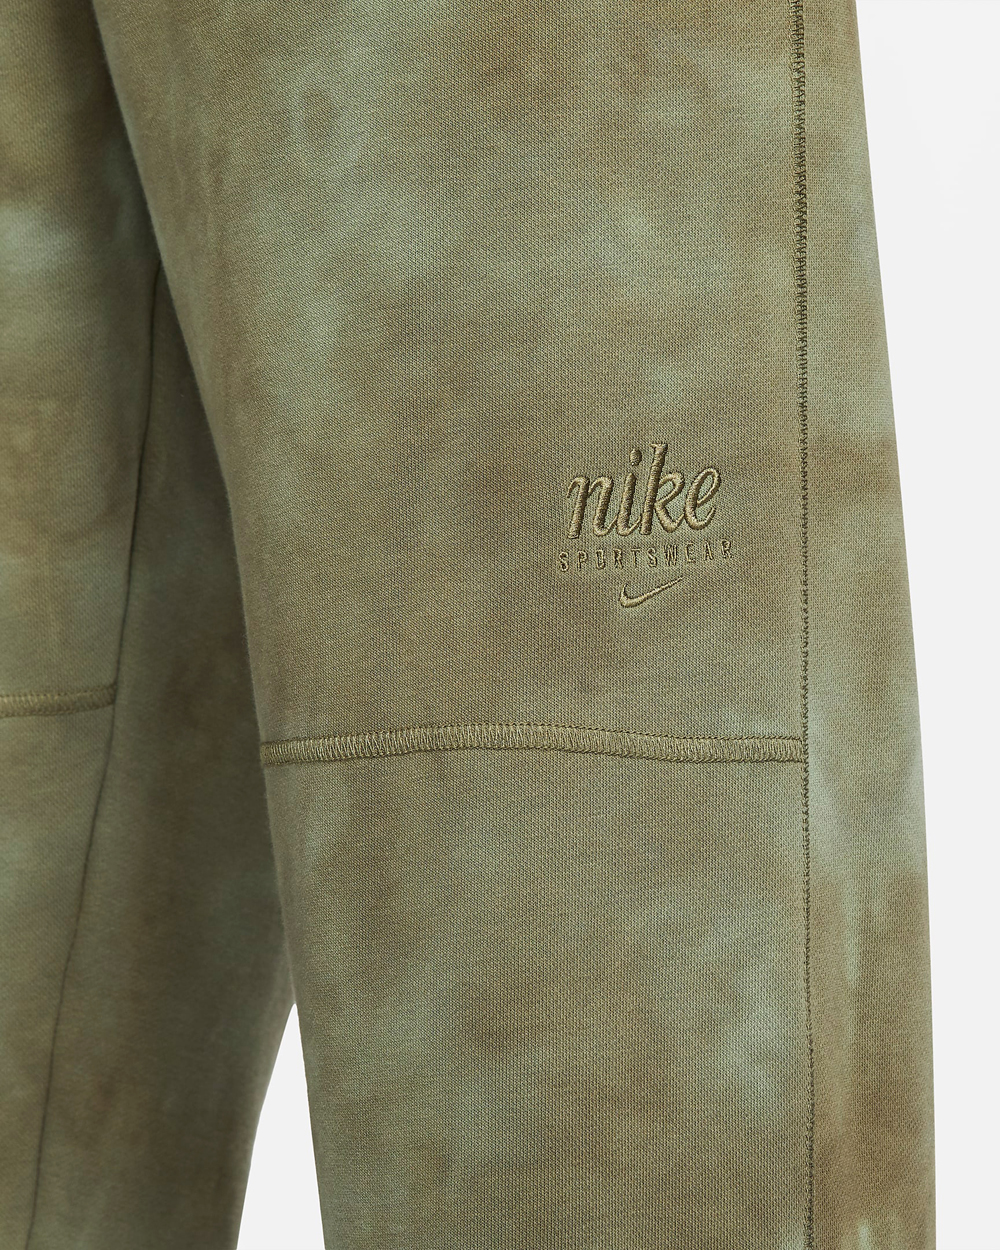 nike-club-fleece-tie-dye-jogger-pants-green-3